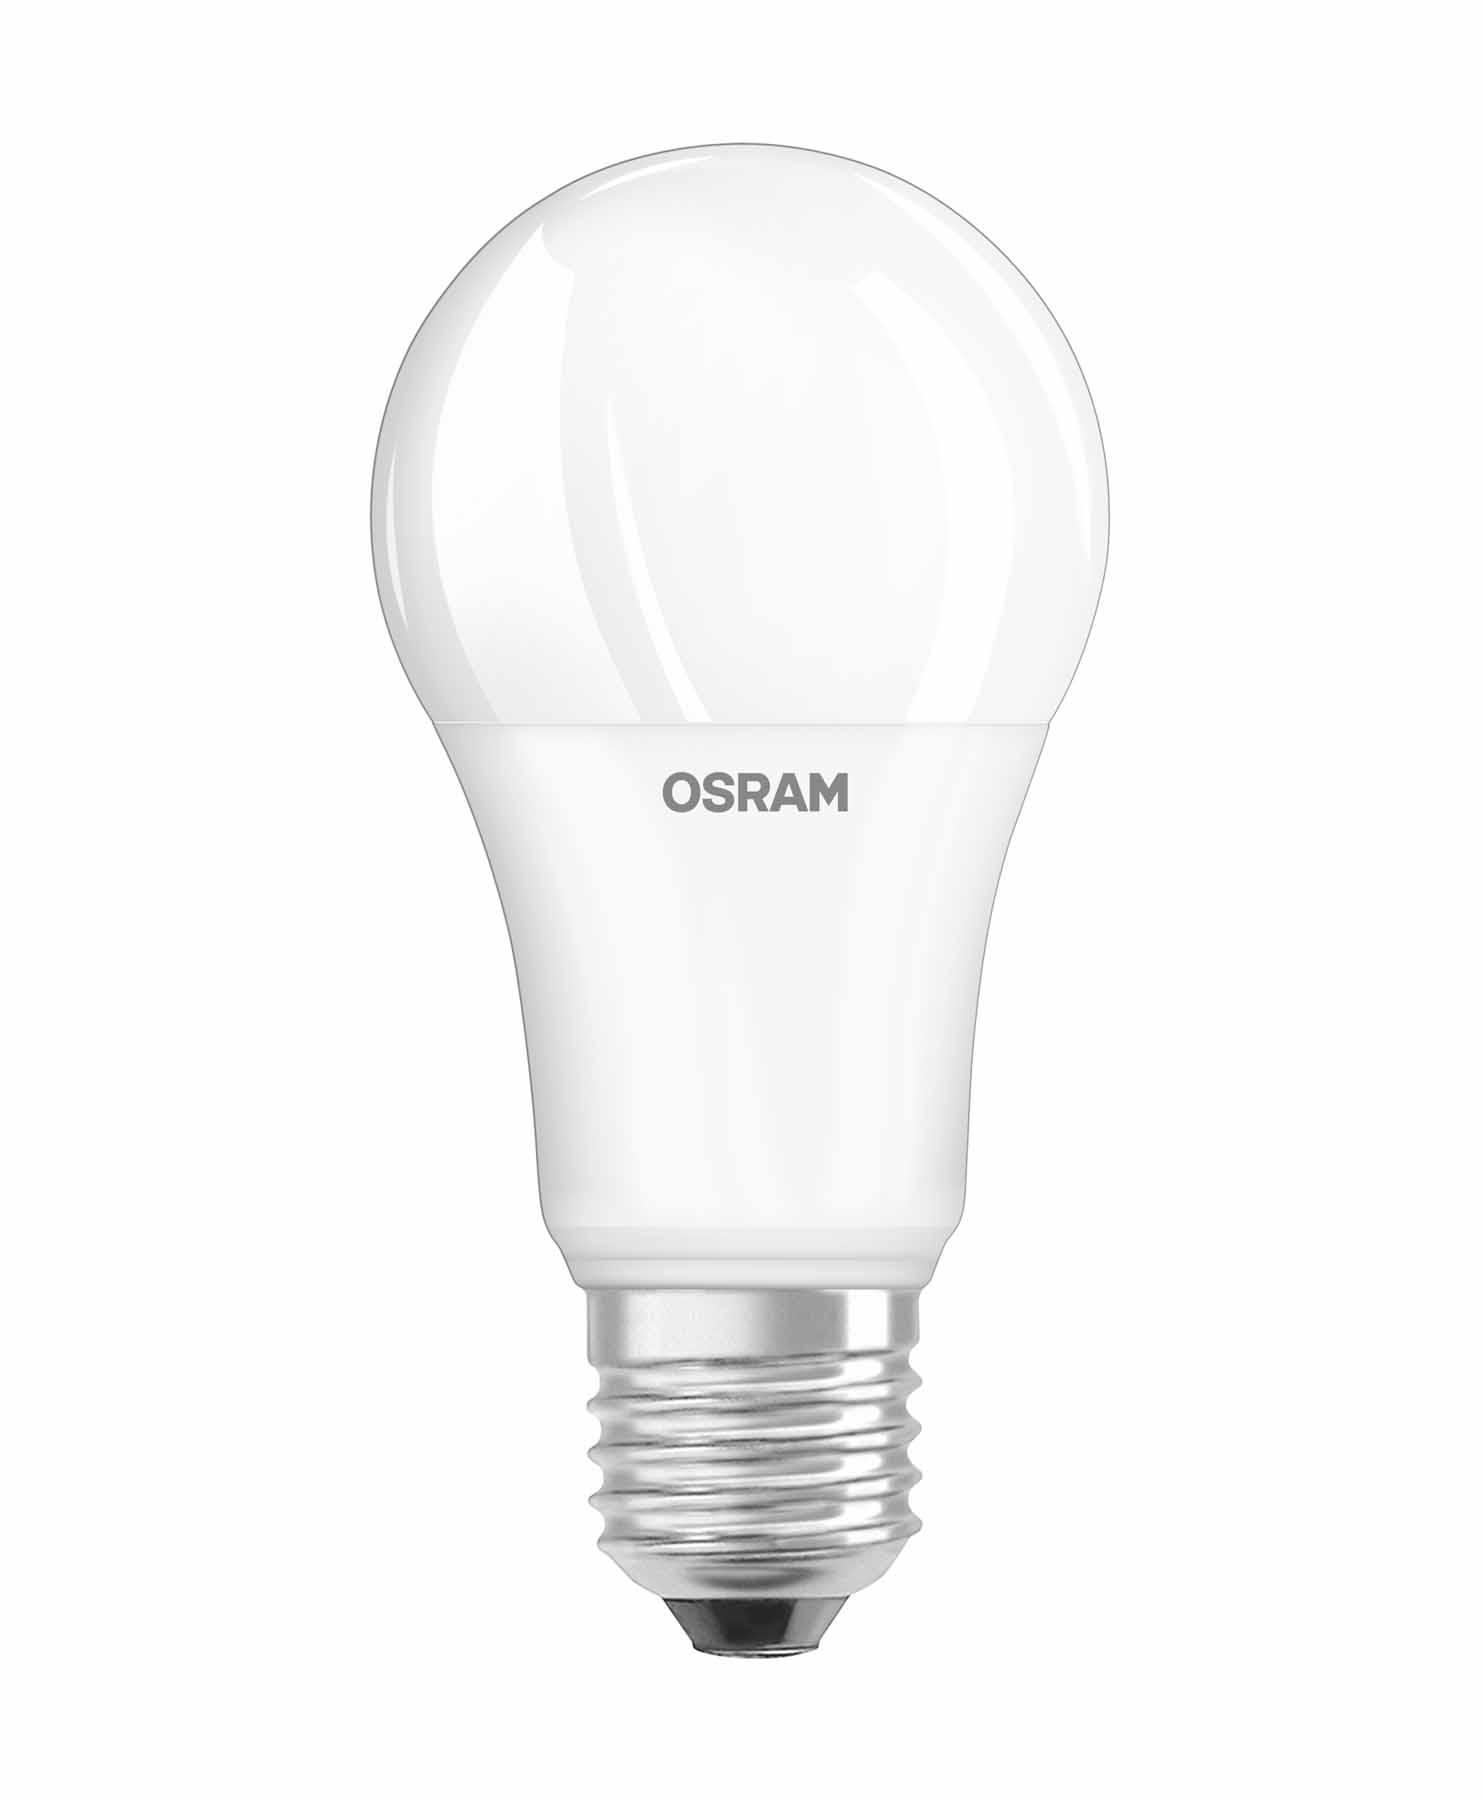 10437-OSRAM-LED-STAR-CLASSIC-A-100-E27-14W-100-Watt-1522-Lumen-neutral-weiss-4000-K-1 Wunderschöne Led Lampen 100 Watt Dekorationen